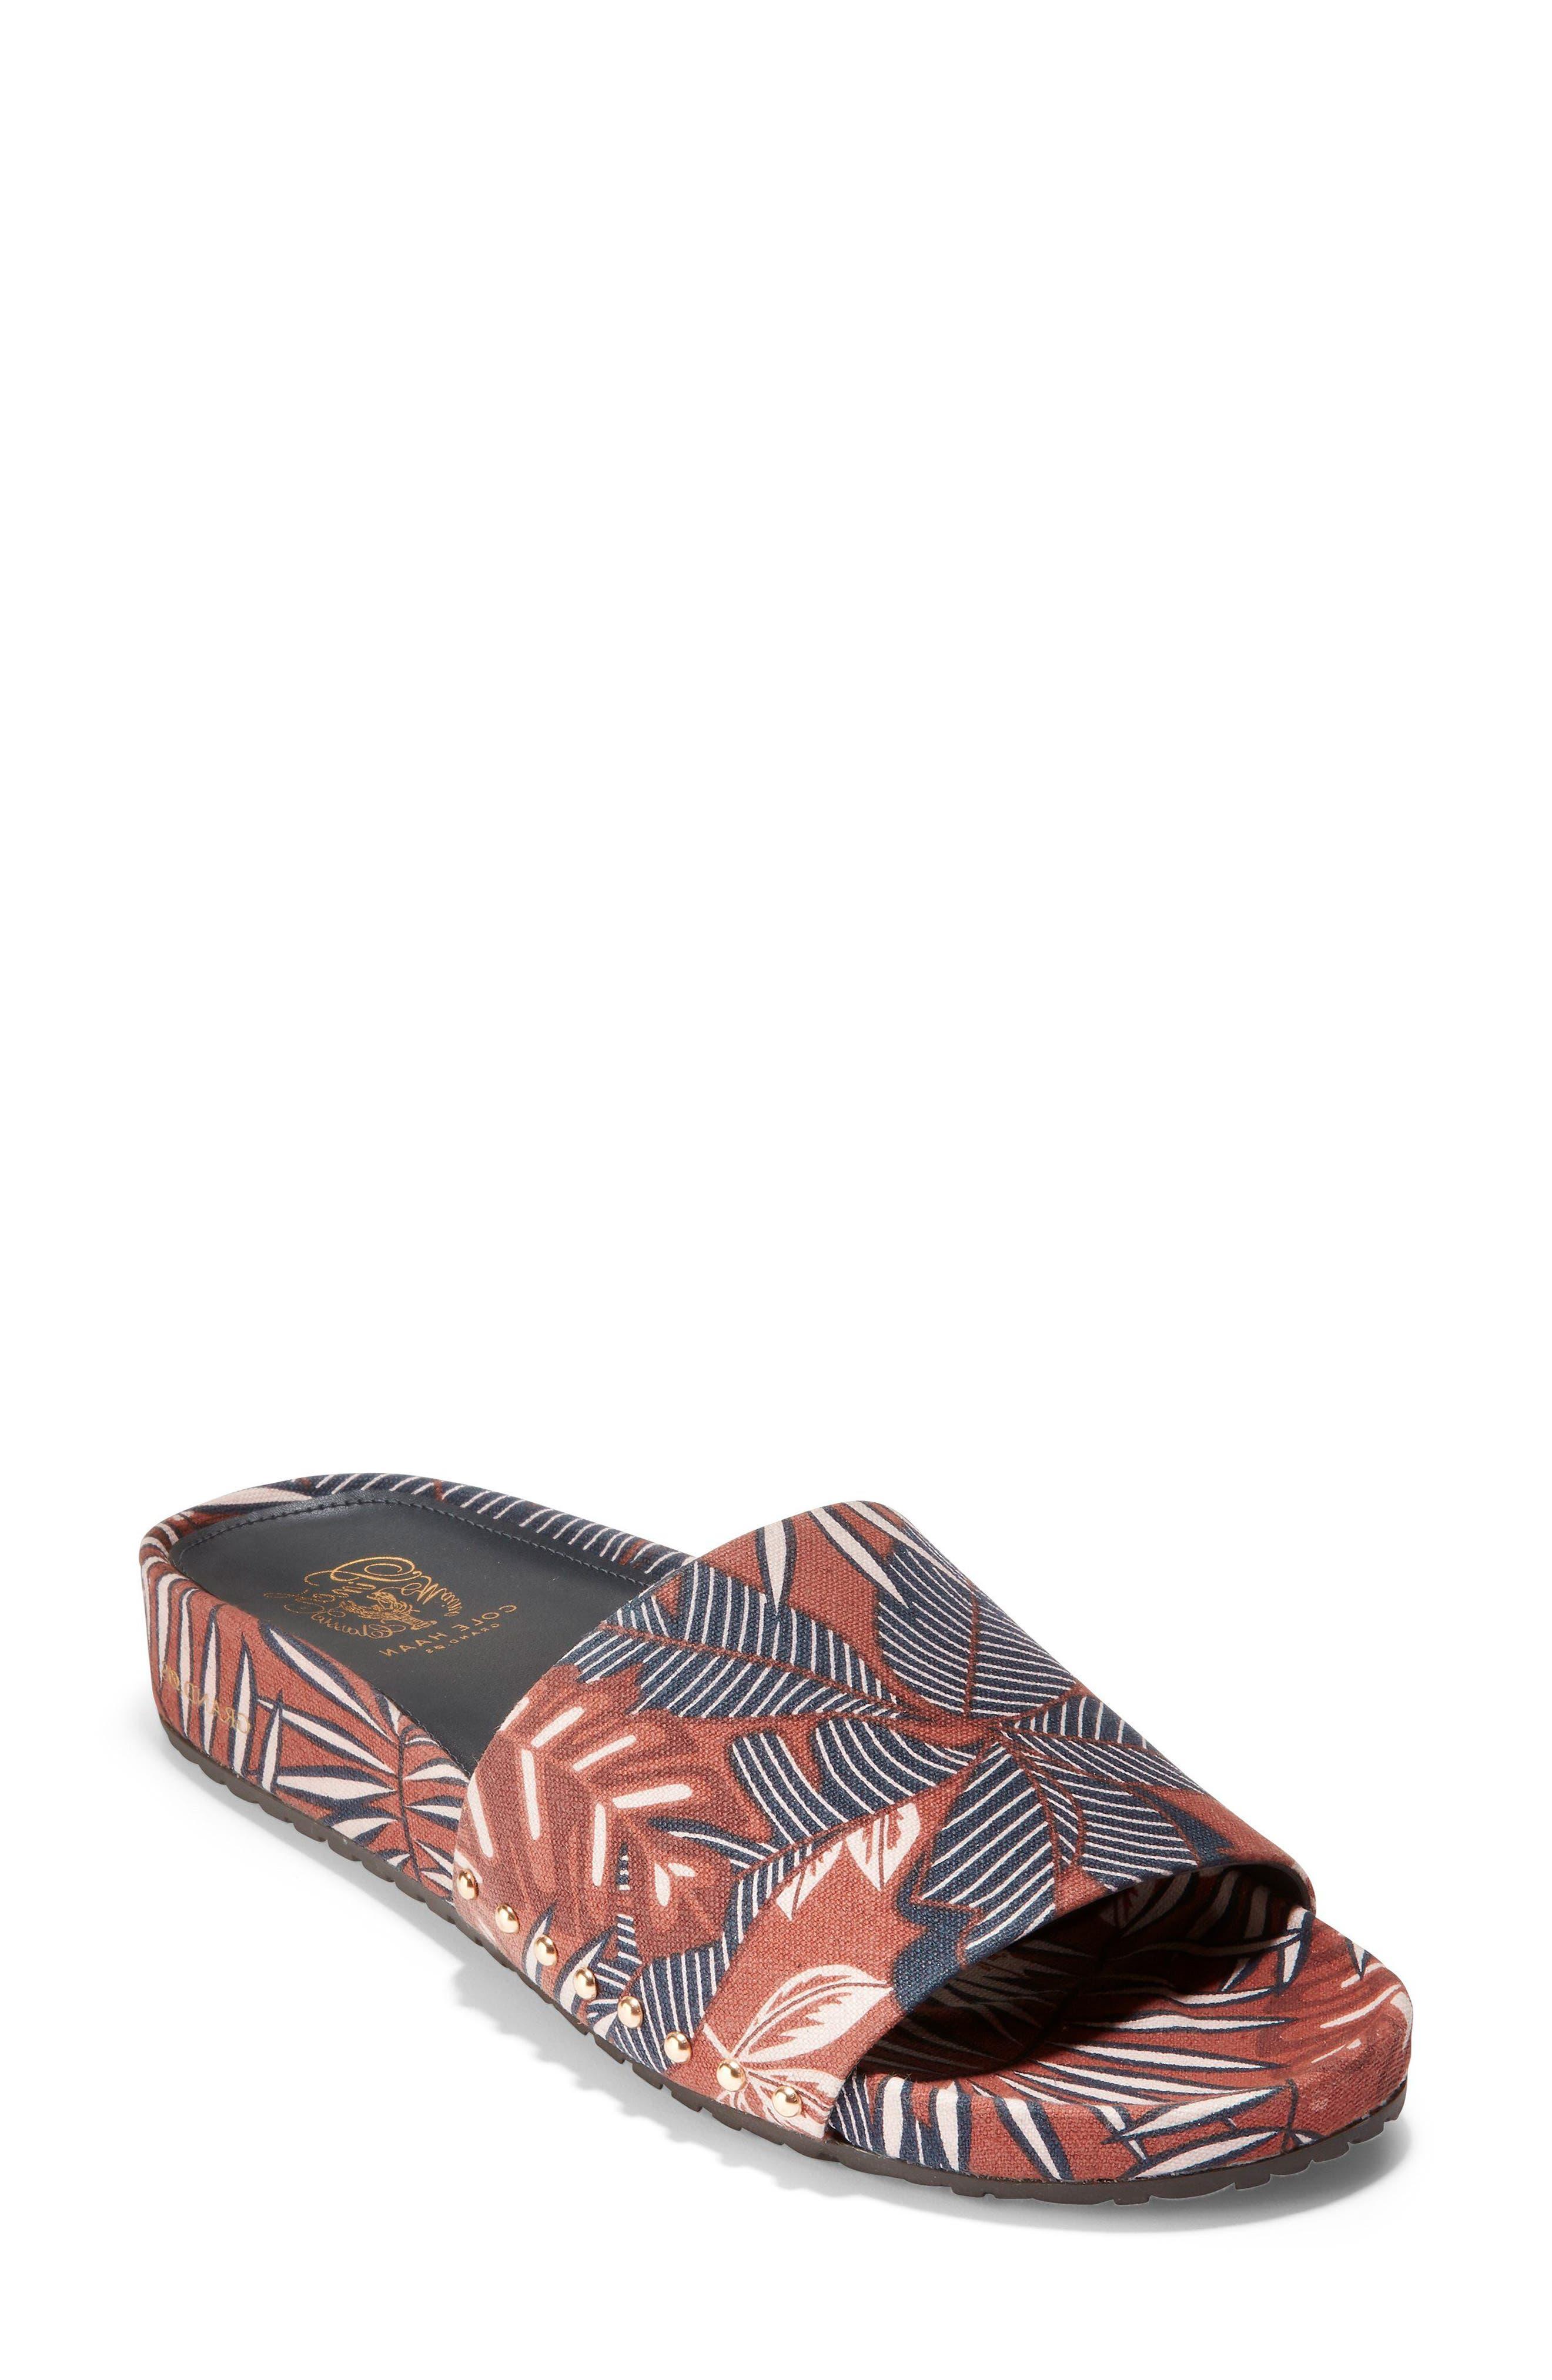 Pinch Montauk Print Slide Sandal,                         Main,                         color, Tropical Palm Print Fabric